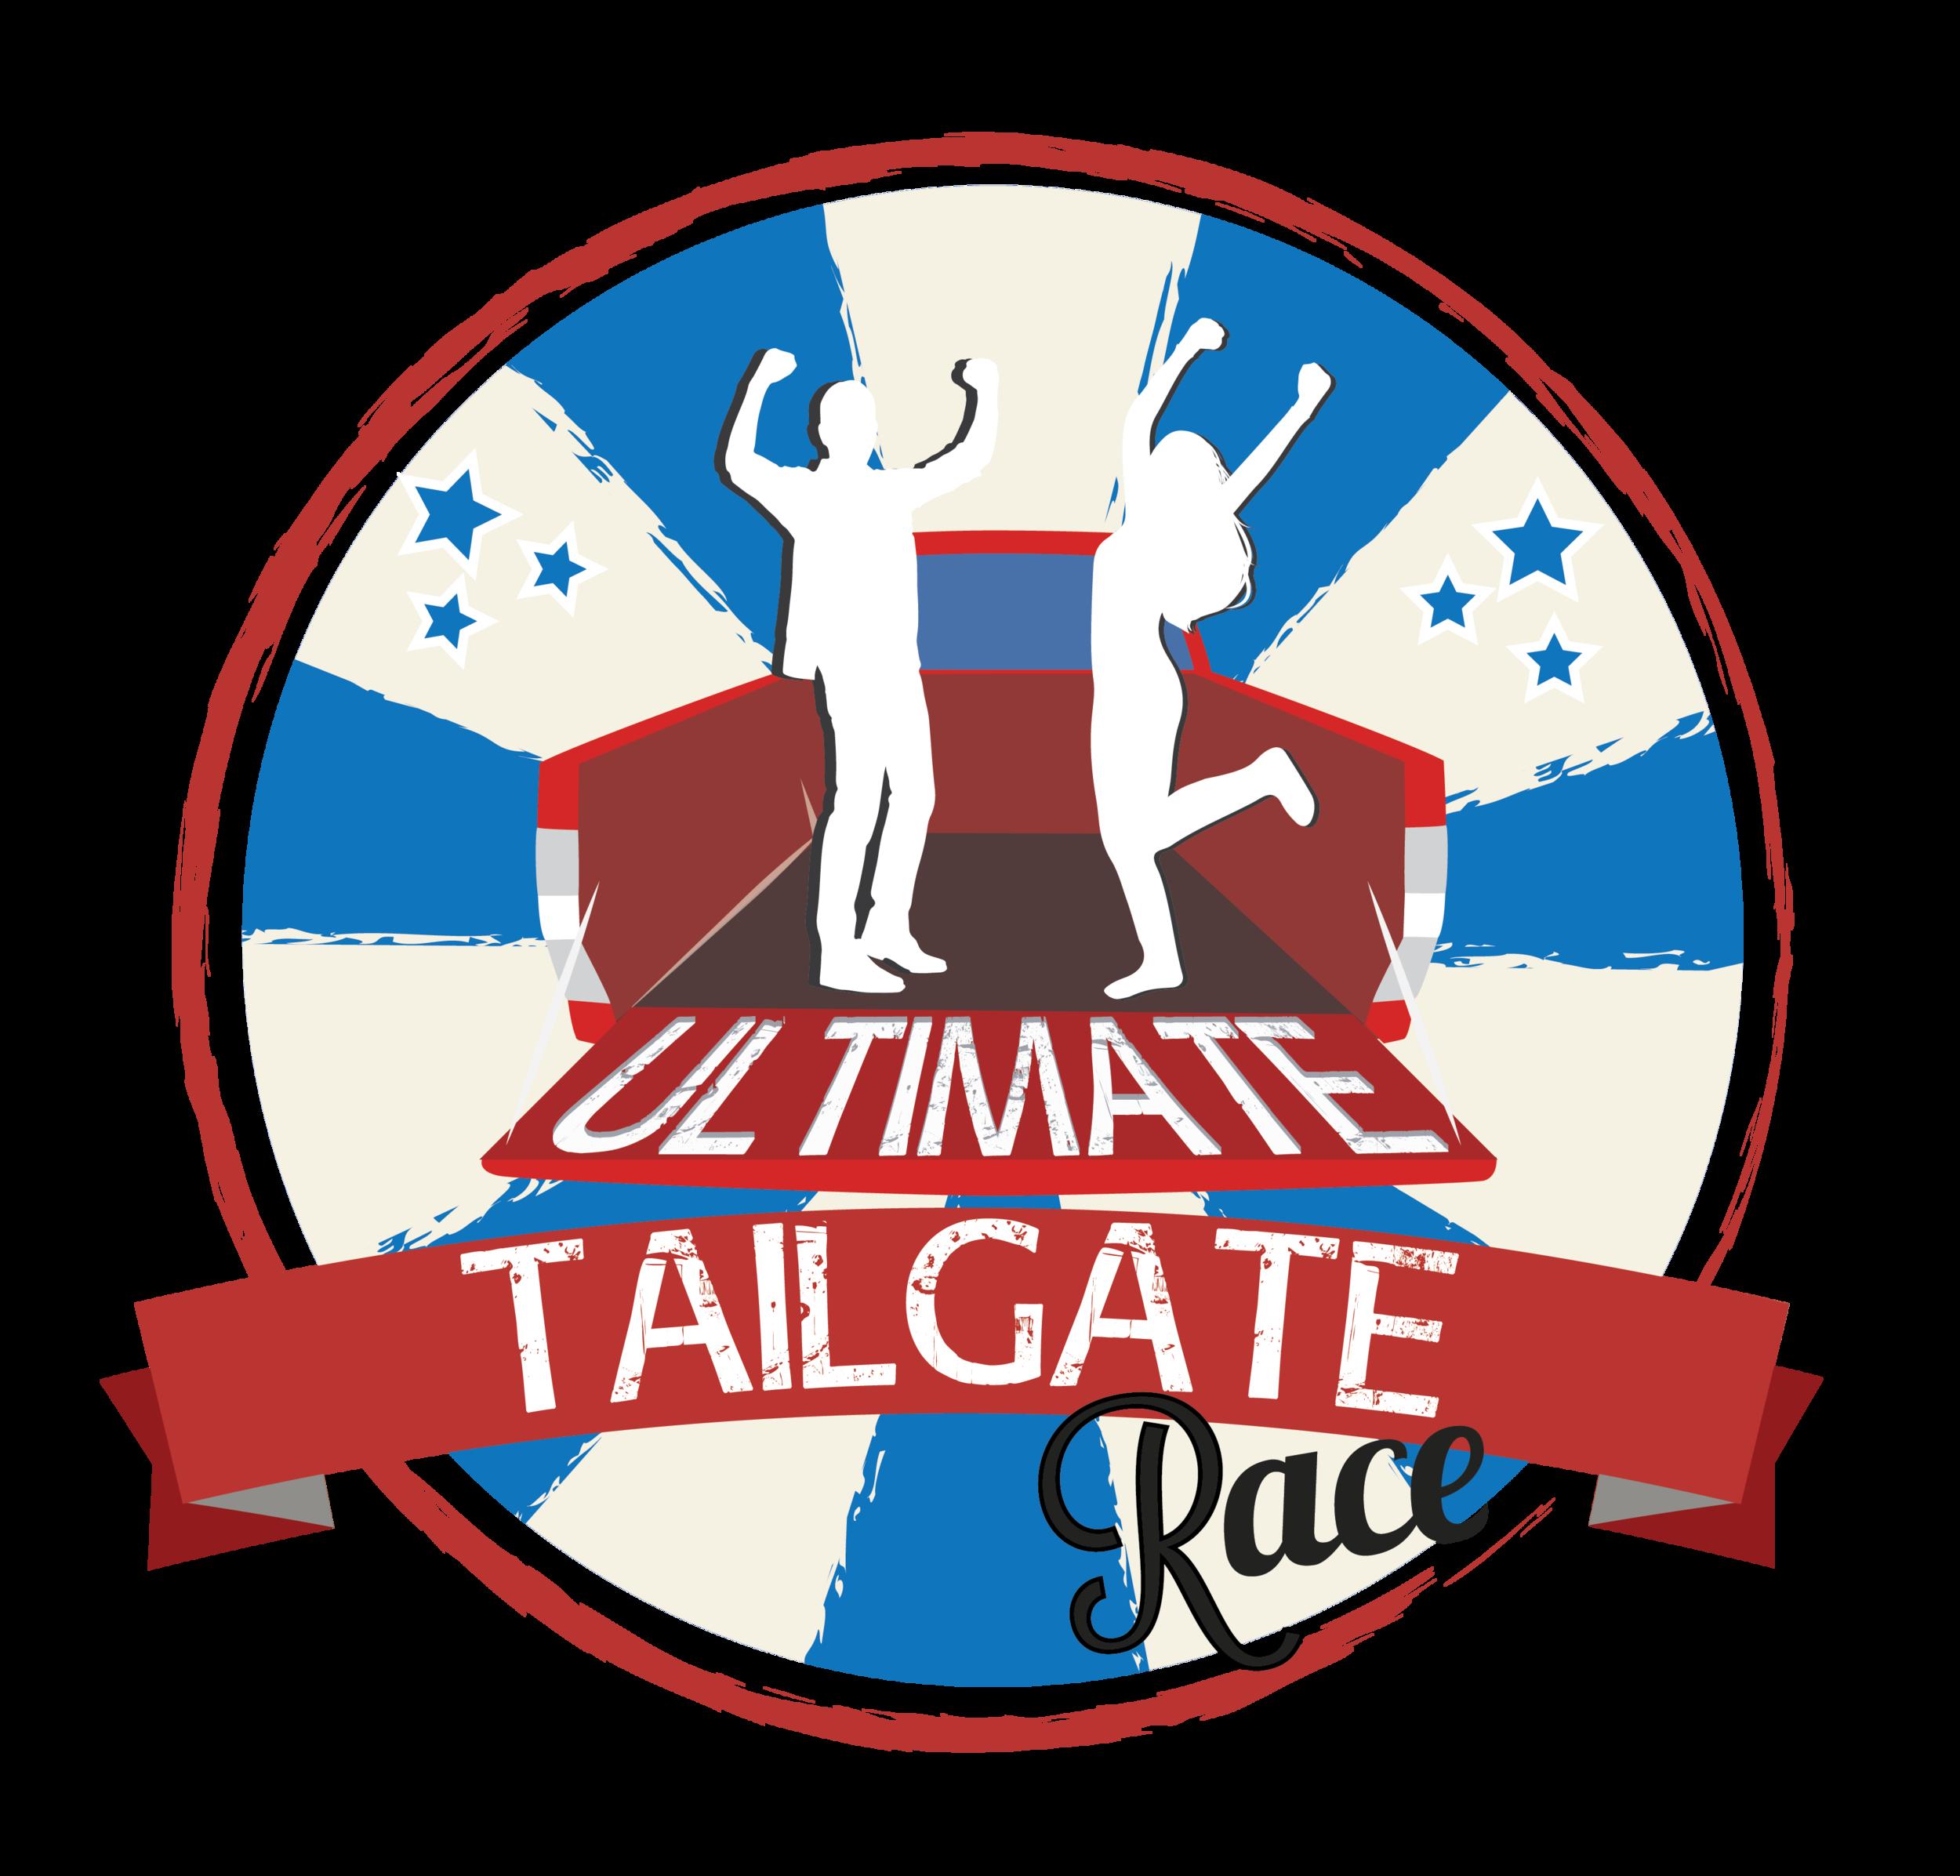 ultimatetailgater_logo-01.png